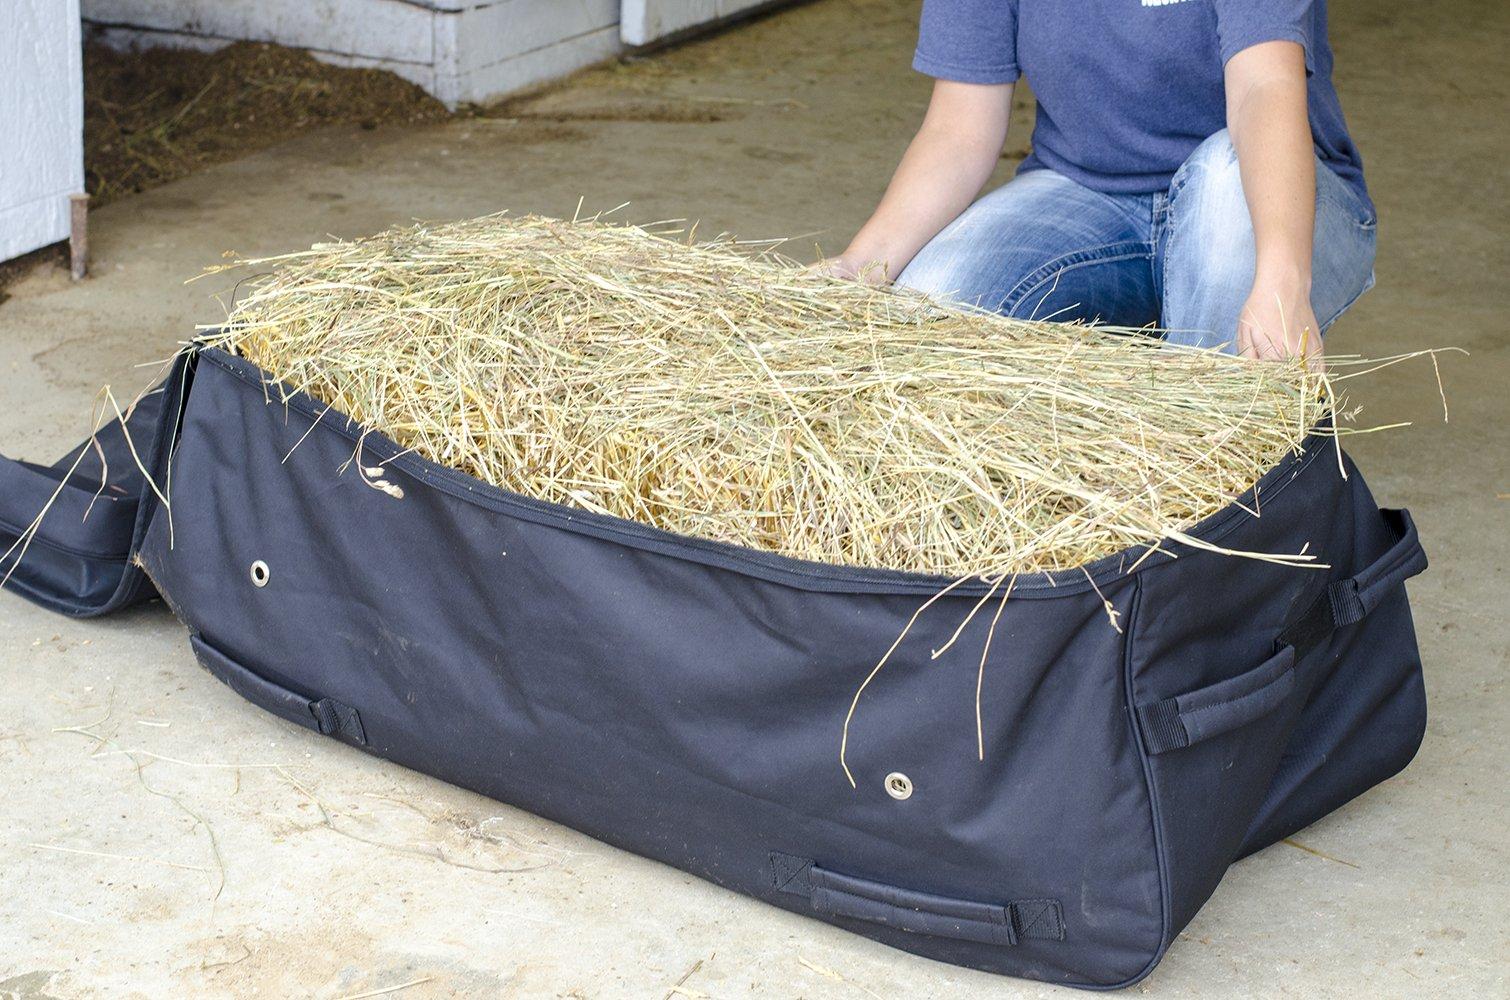 Derby Originals Waterproof Heavy Duty Rolling Hay Bale Bag with Warranty- Portable Multiple Purpose Use